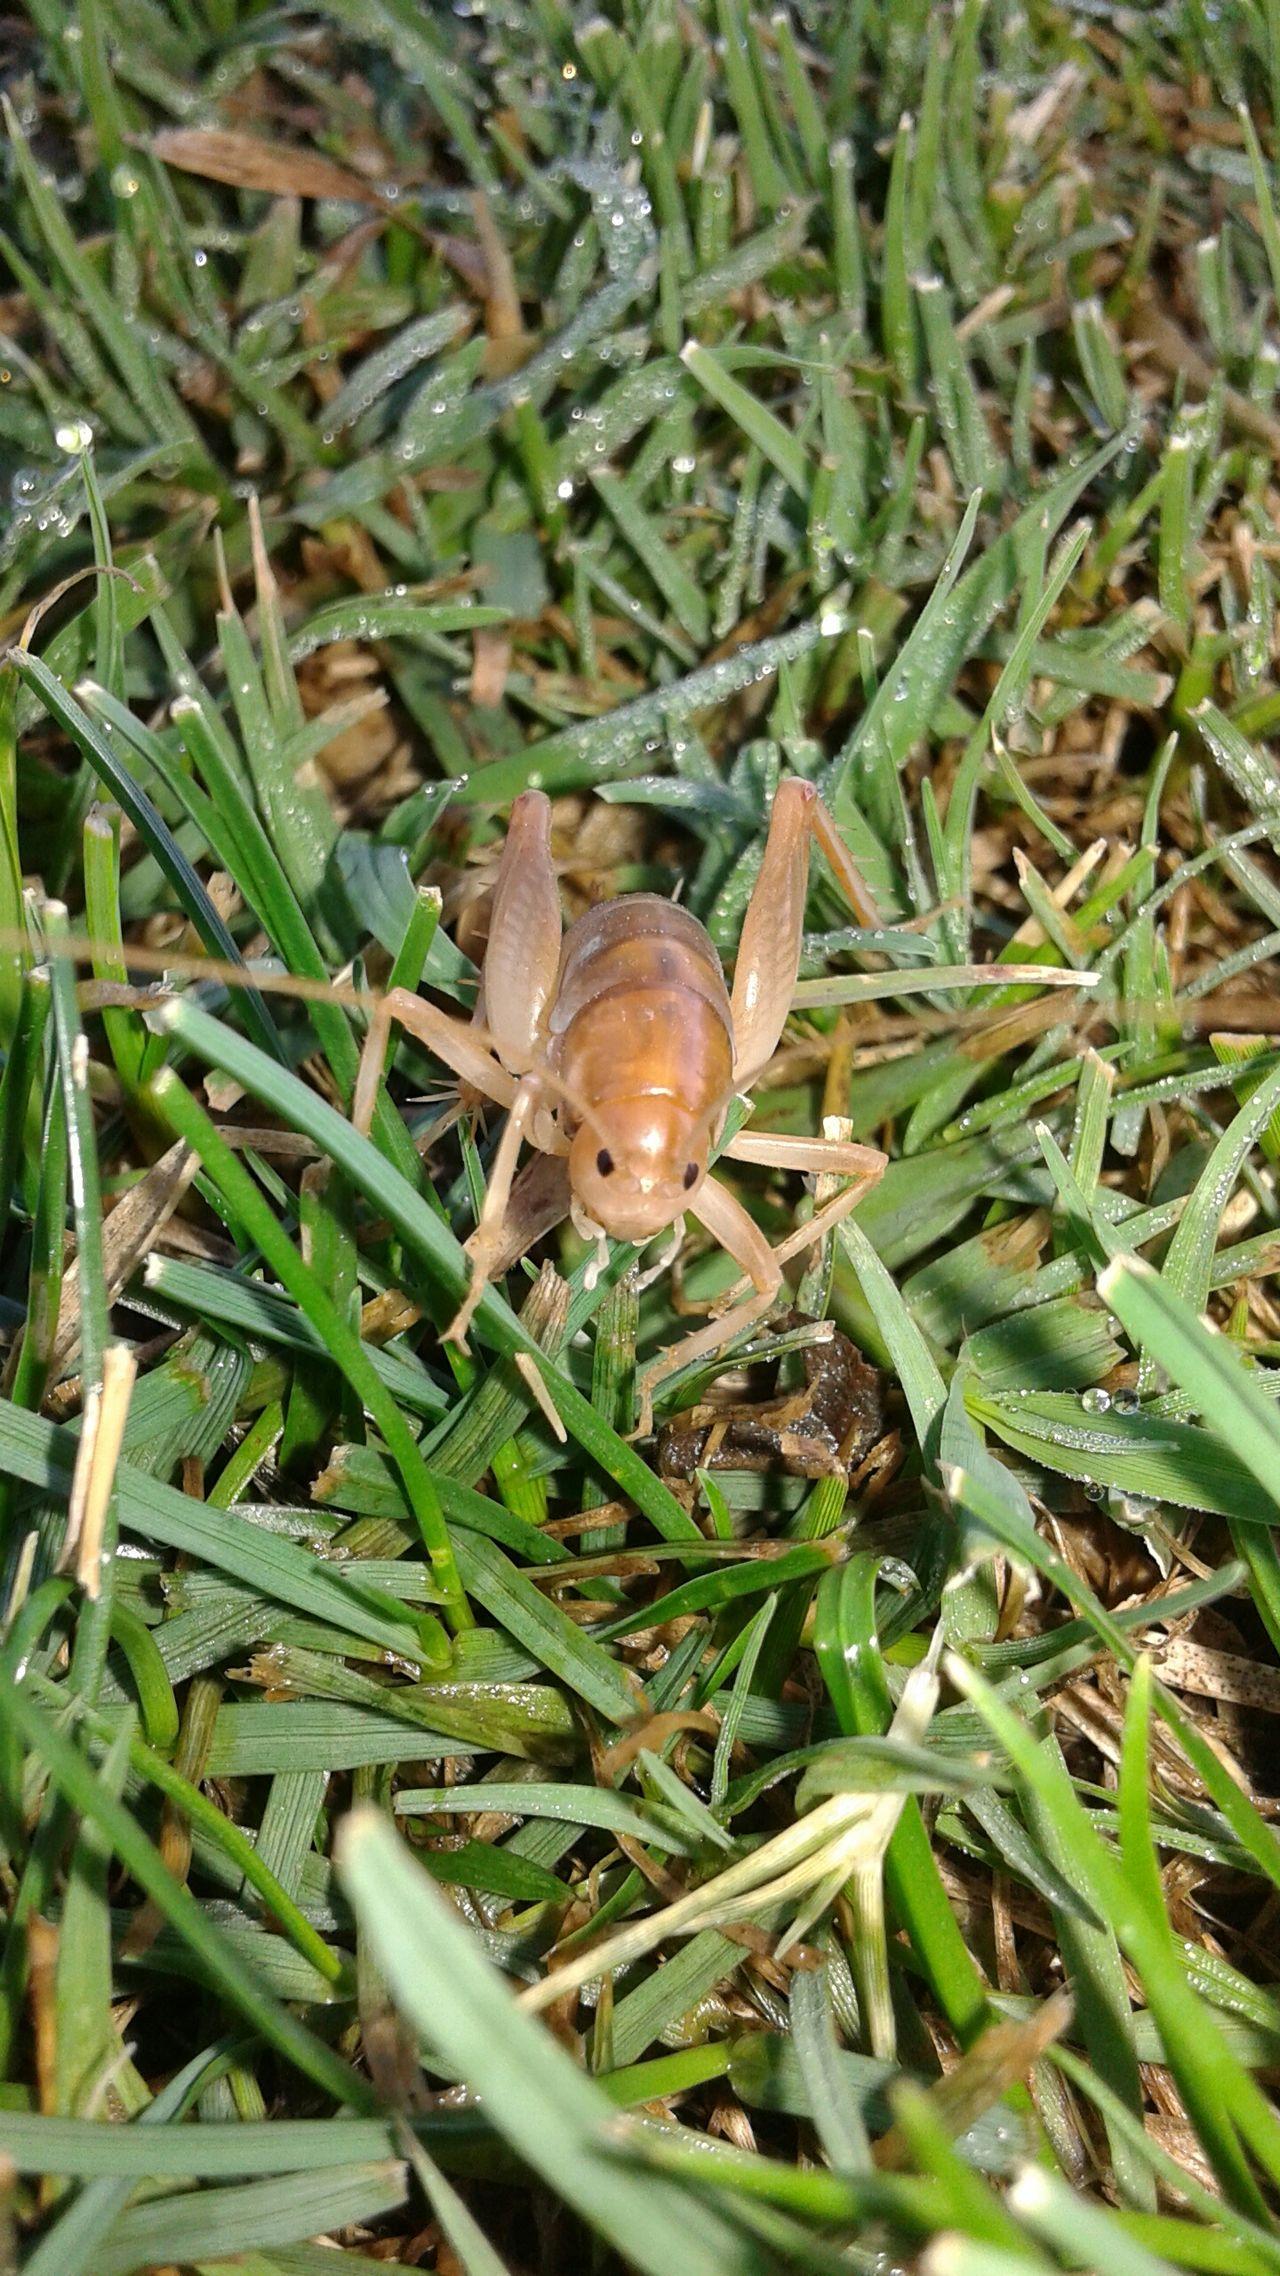 Grass Young Grasshopper Crickets Grasshopper Nature Upcloseandpersonal Bugs